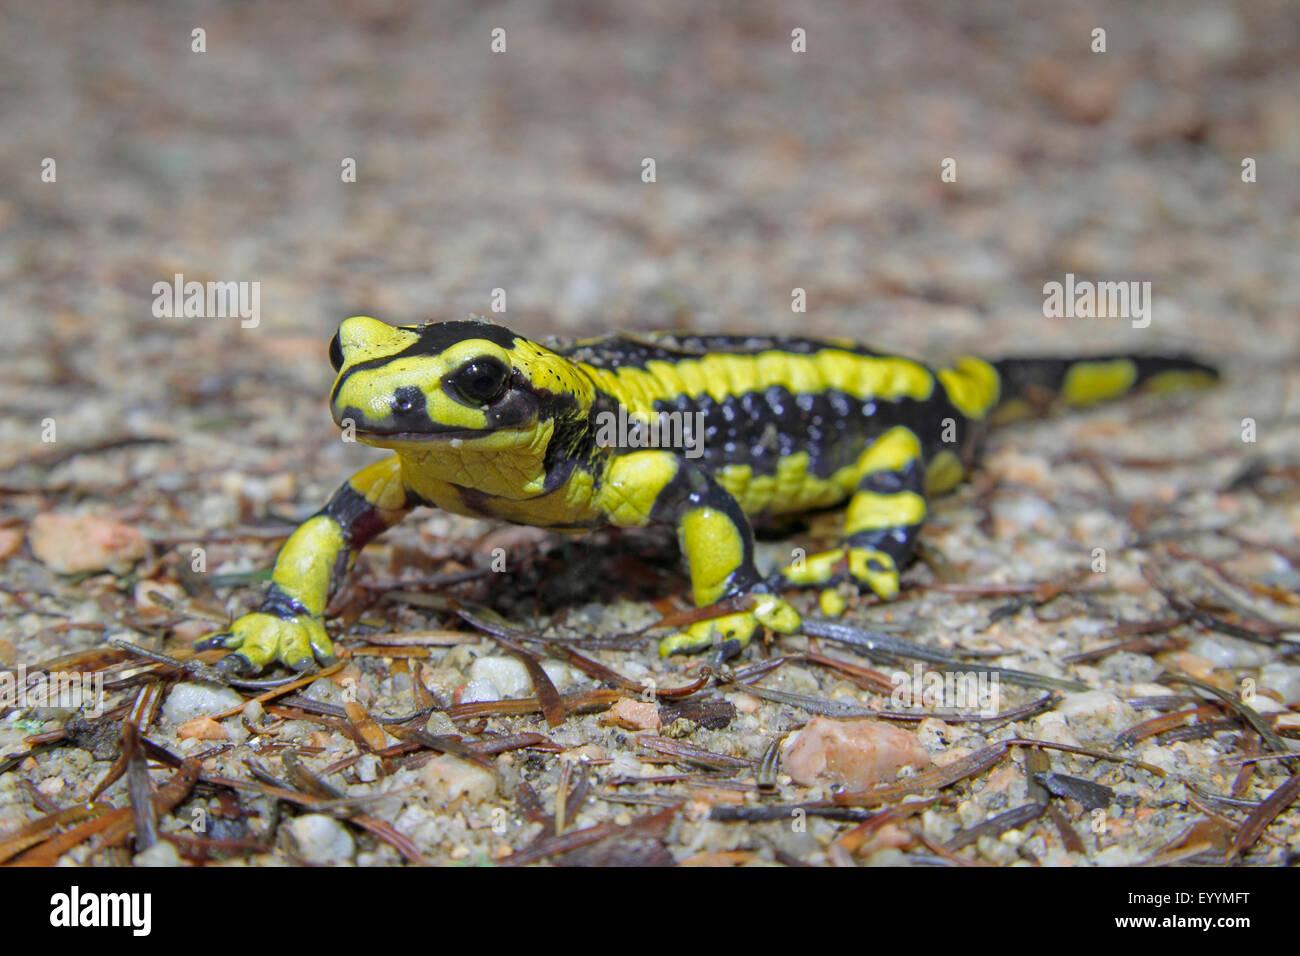 Salamandre terrestre européen (Salamandra salamandra), fire salamander marcher sur le terrain, l'Allemagne, Bade-Wurtemberg Banque D'Images